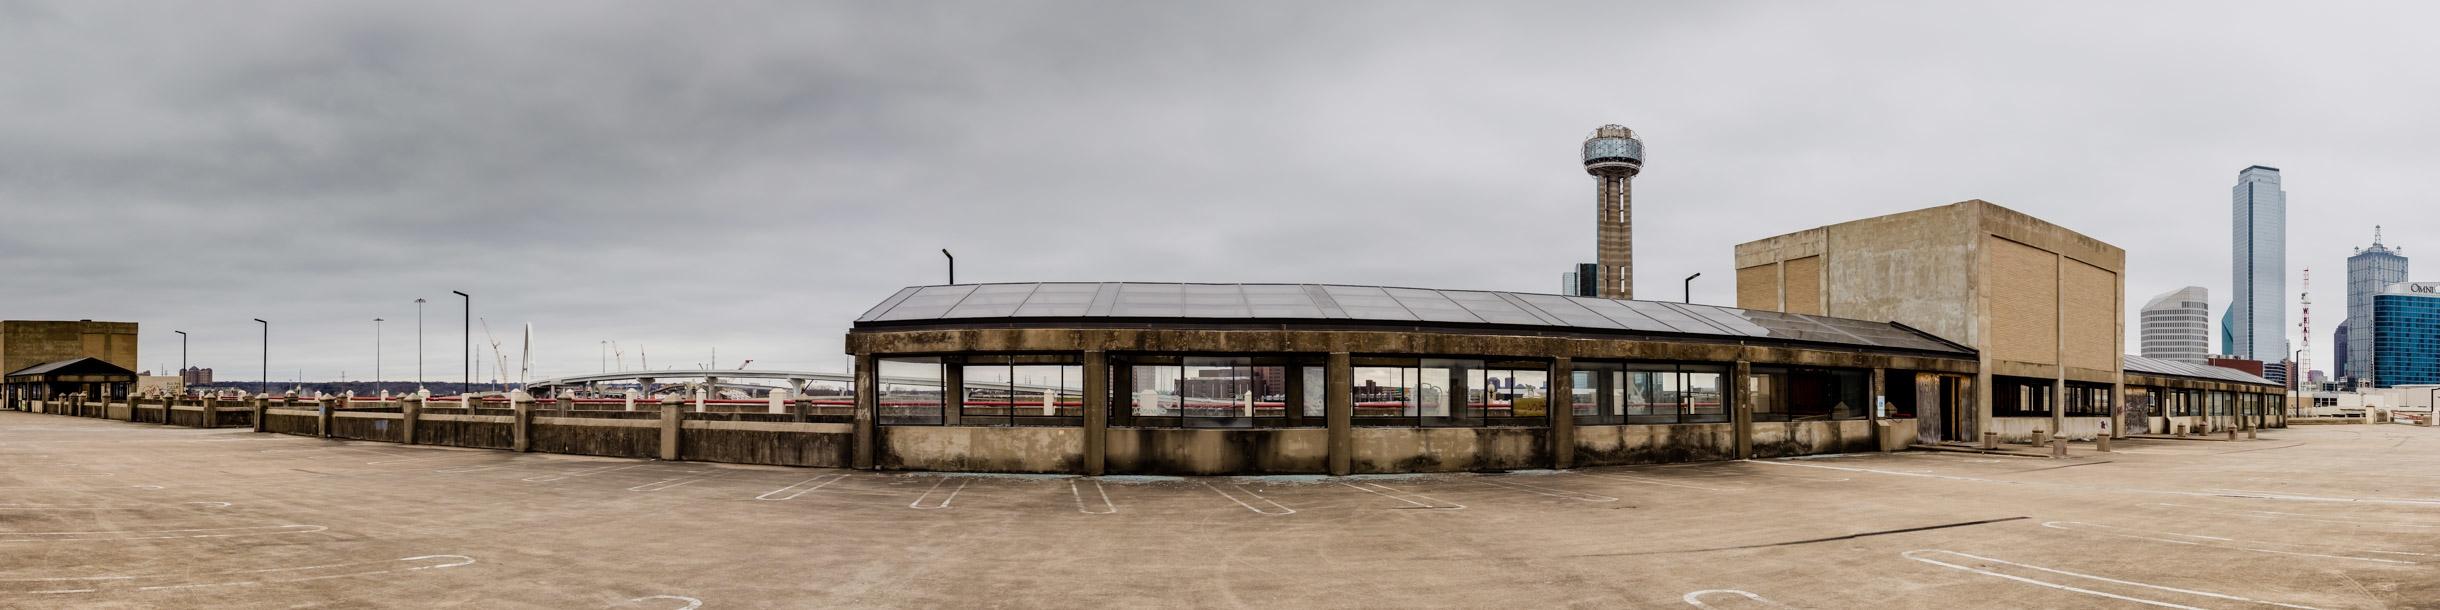 dallas skyline abandoned garage.jpg